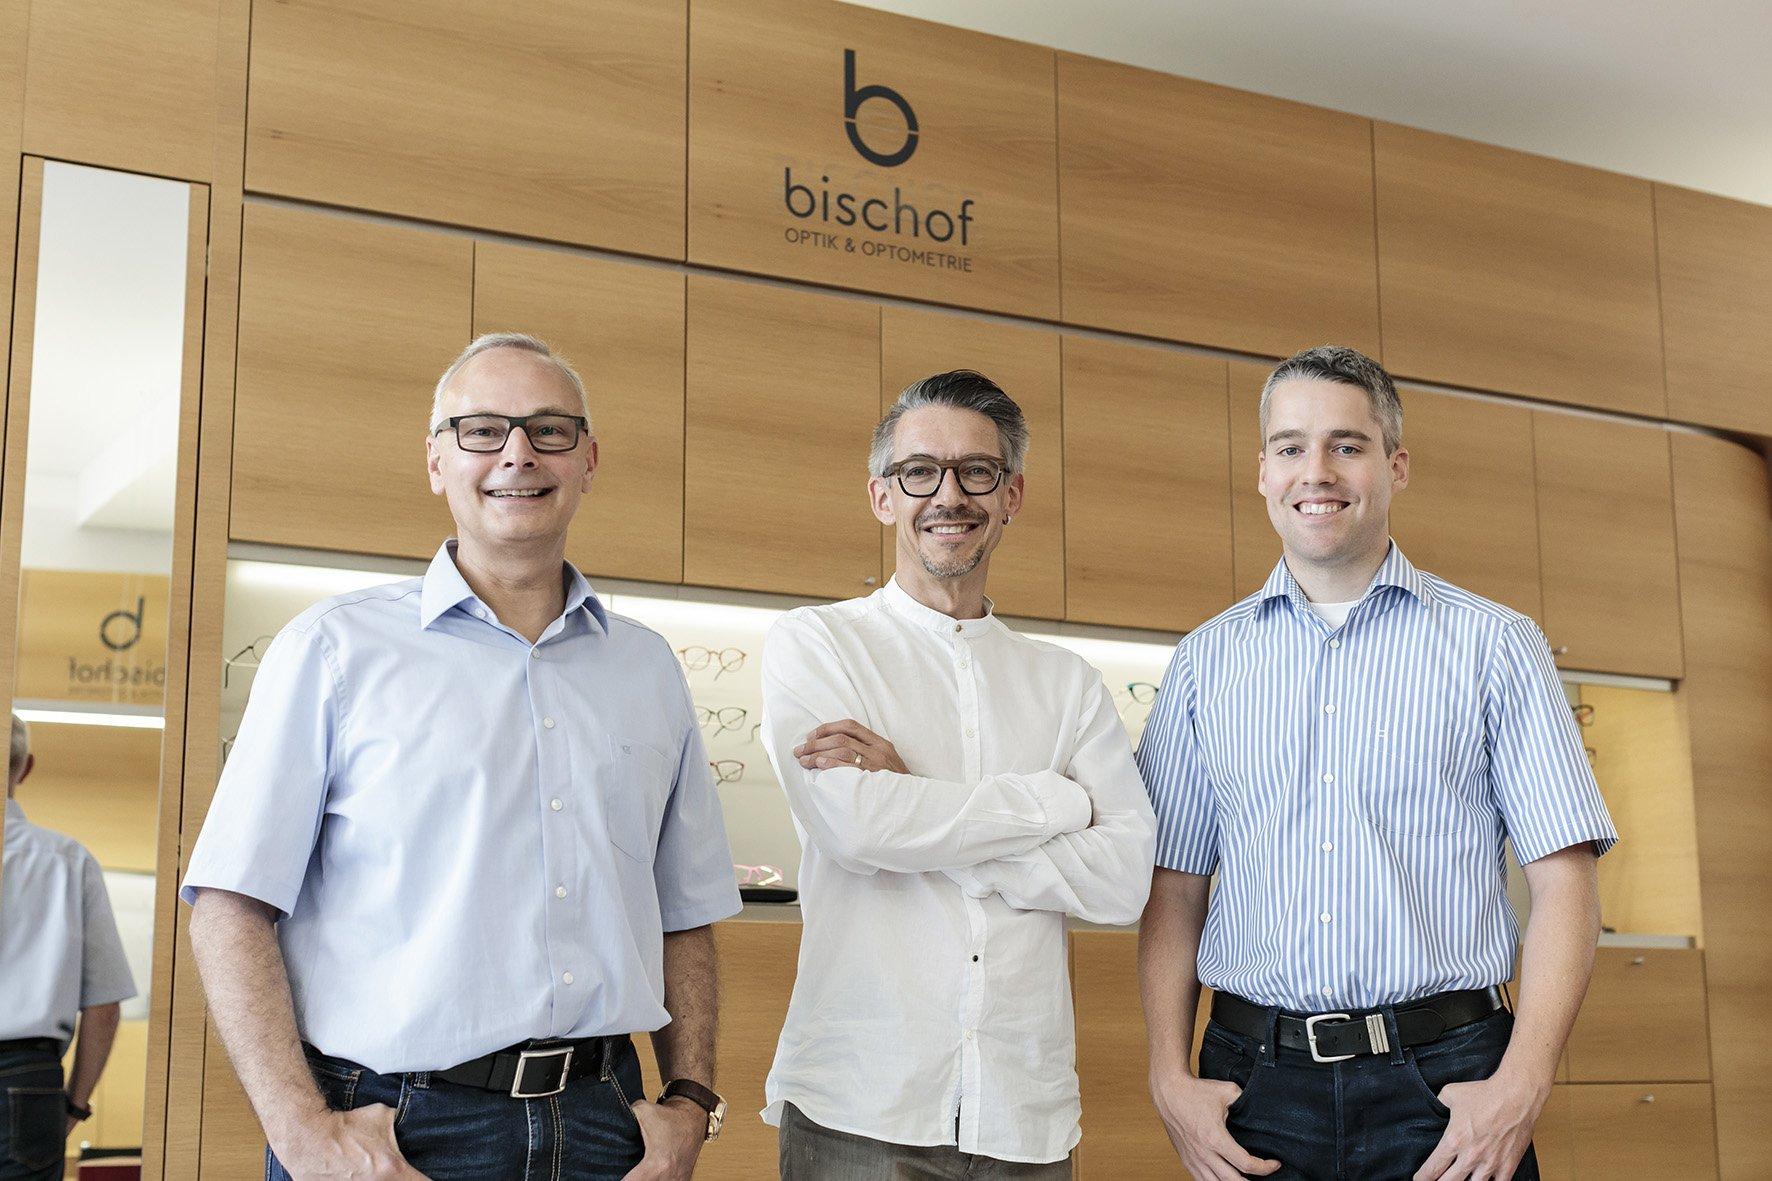 Frank Rosskopf, Urs Betschart und Claudio Jäger